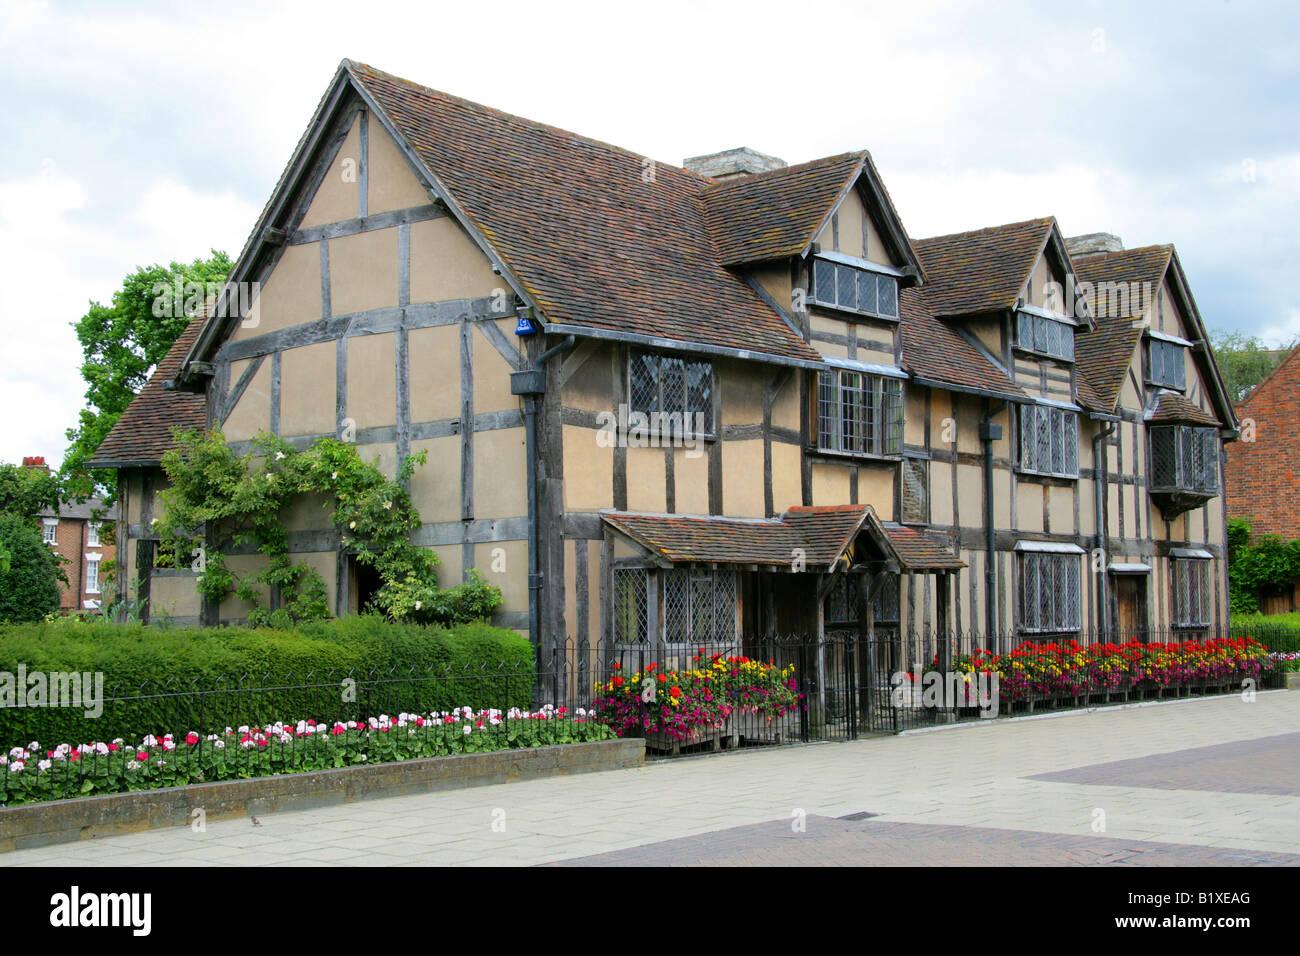 The Birthplace Of William Shakespeare 1564 1616 Stratford Upon Avon Warwickshire UK England